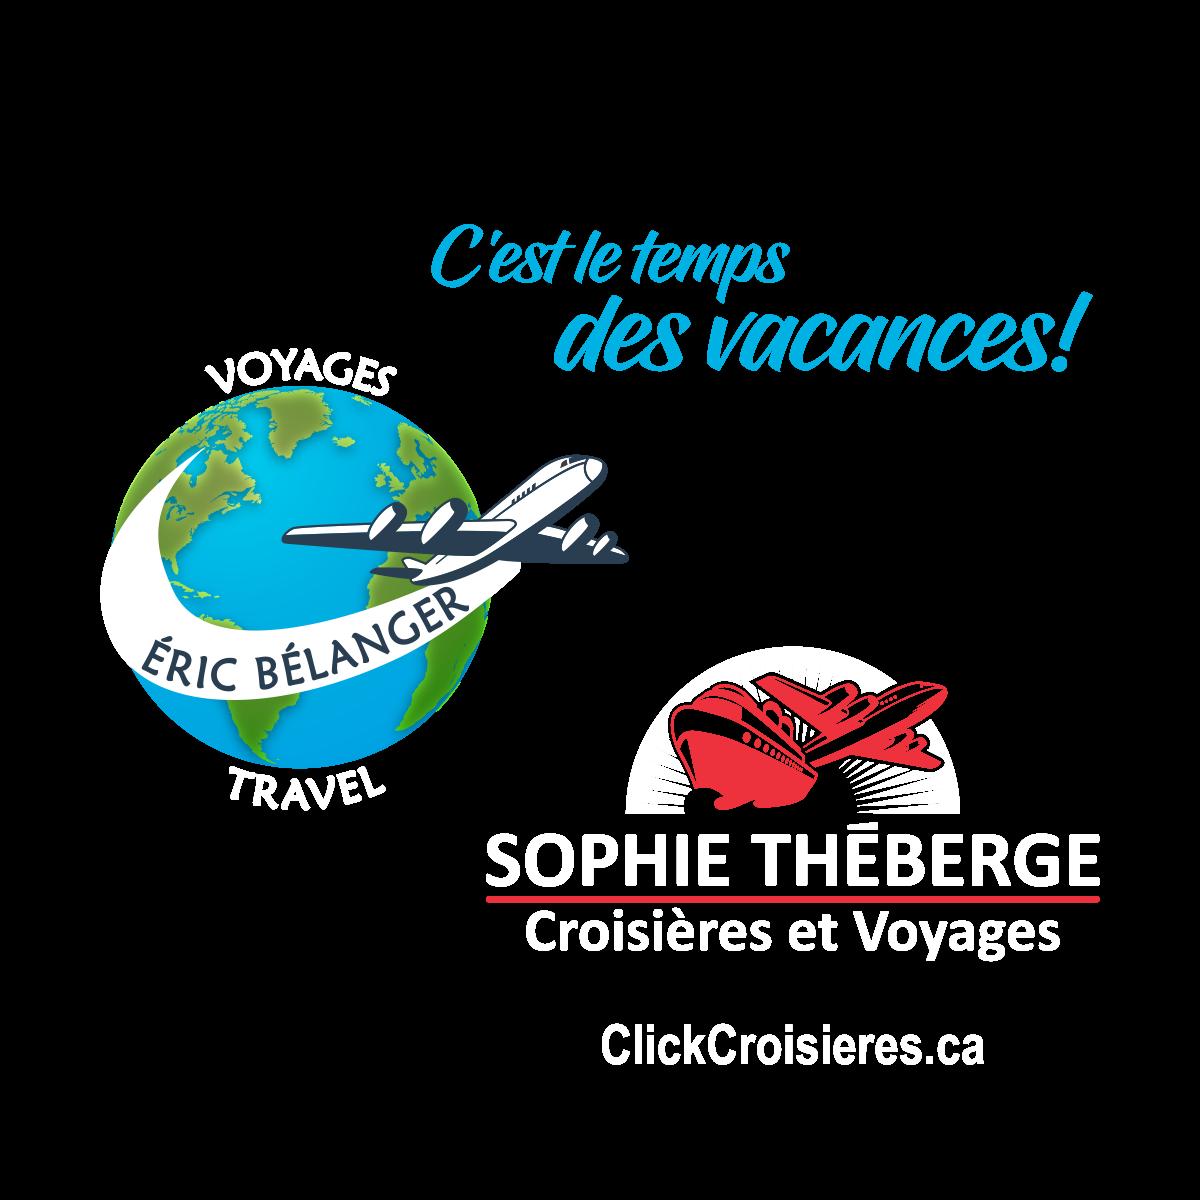 Agence de voyage Eric Bélanger & Sophie Théberge